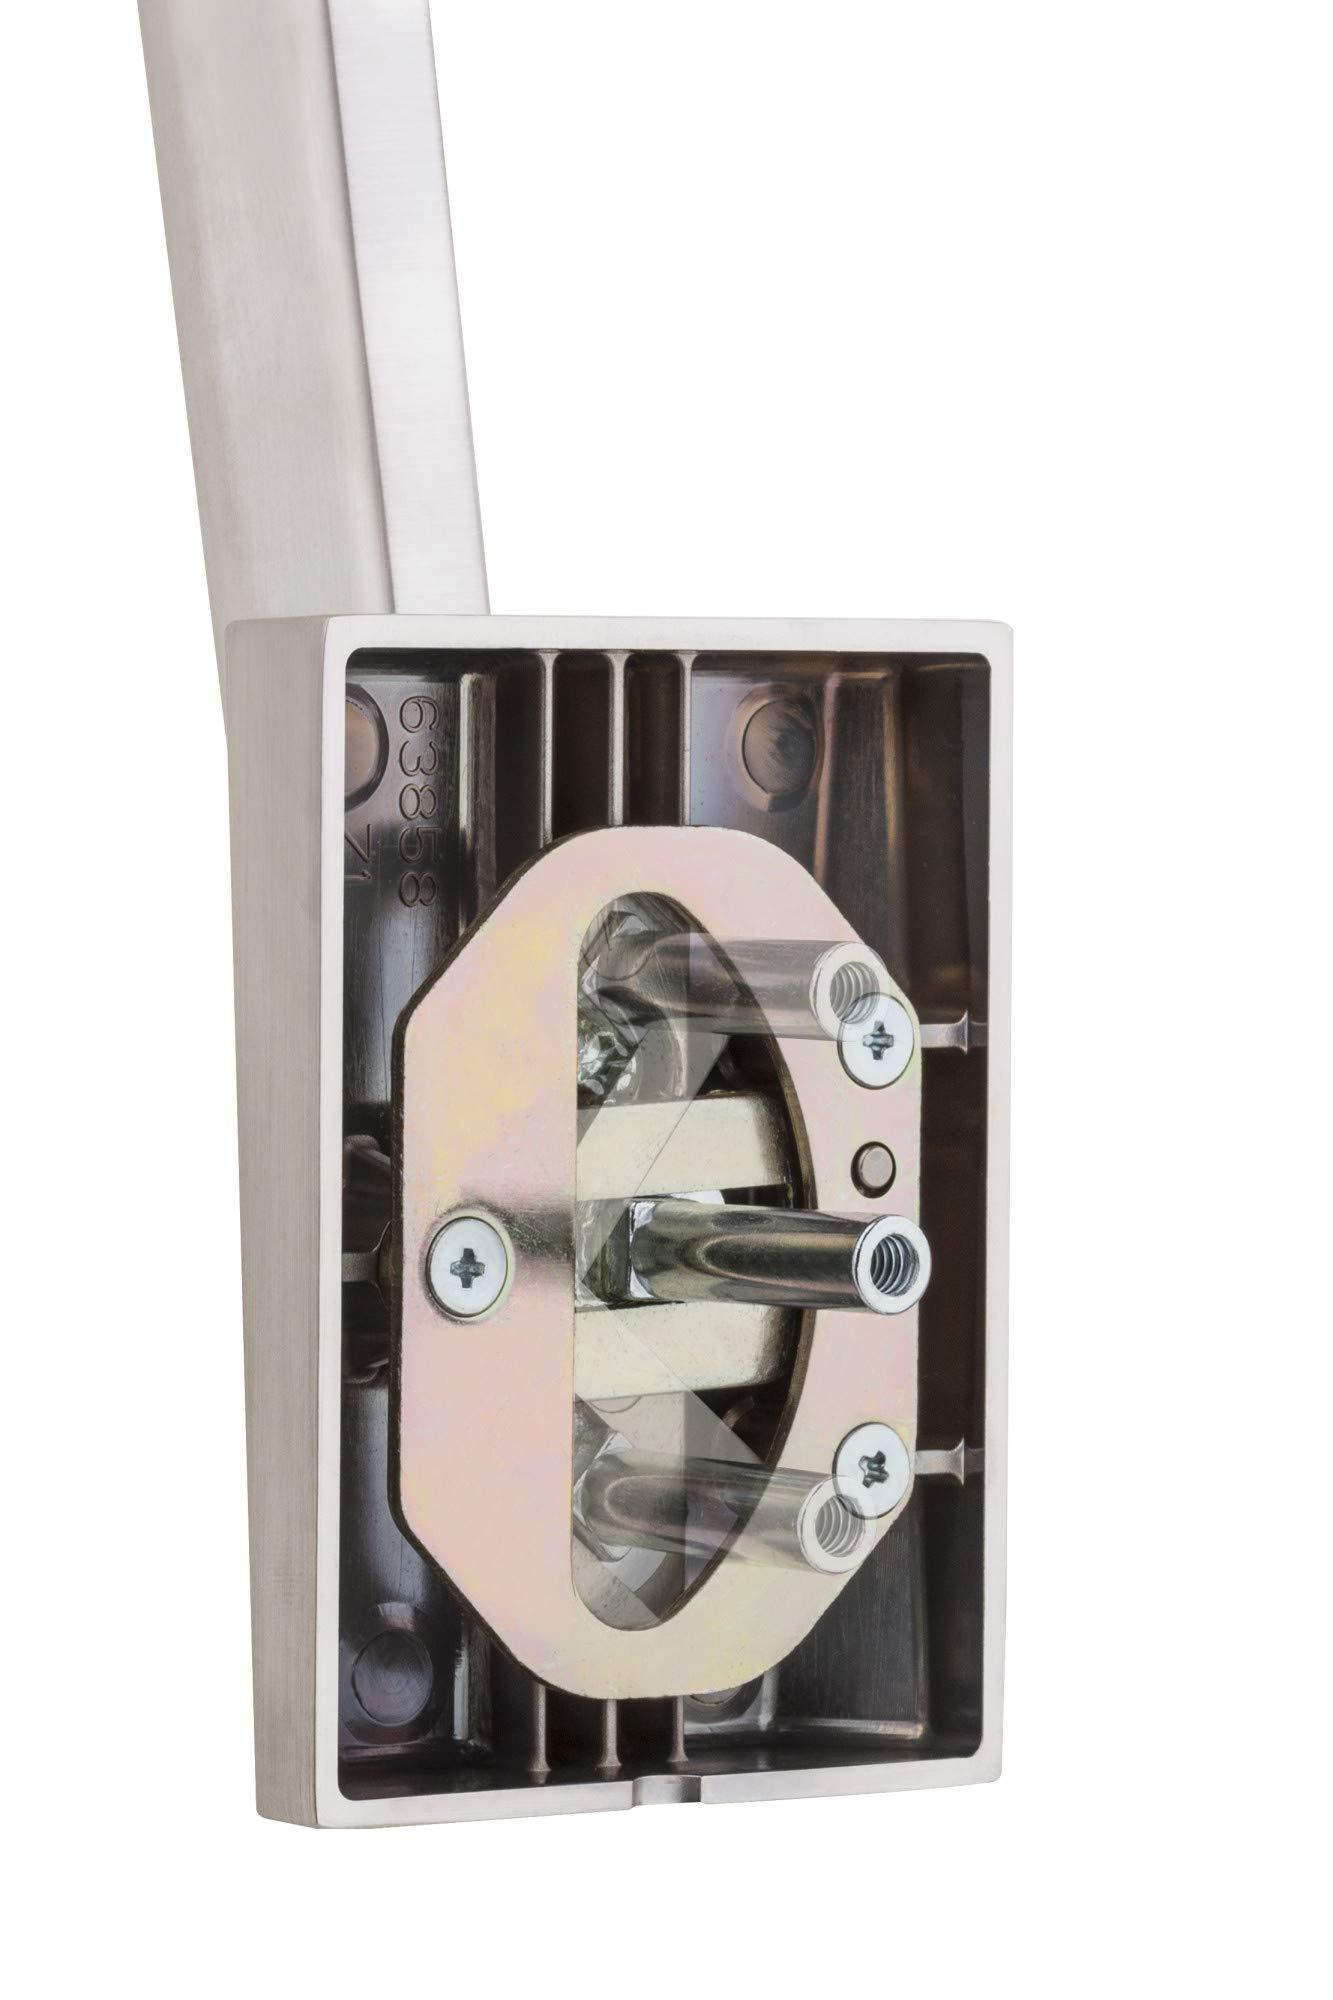 Kwikset 815SCEHFL-15 San Clemente Trim Handleset Satin Nickel